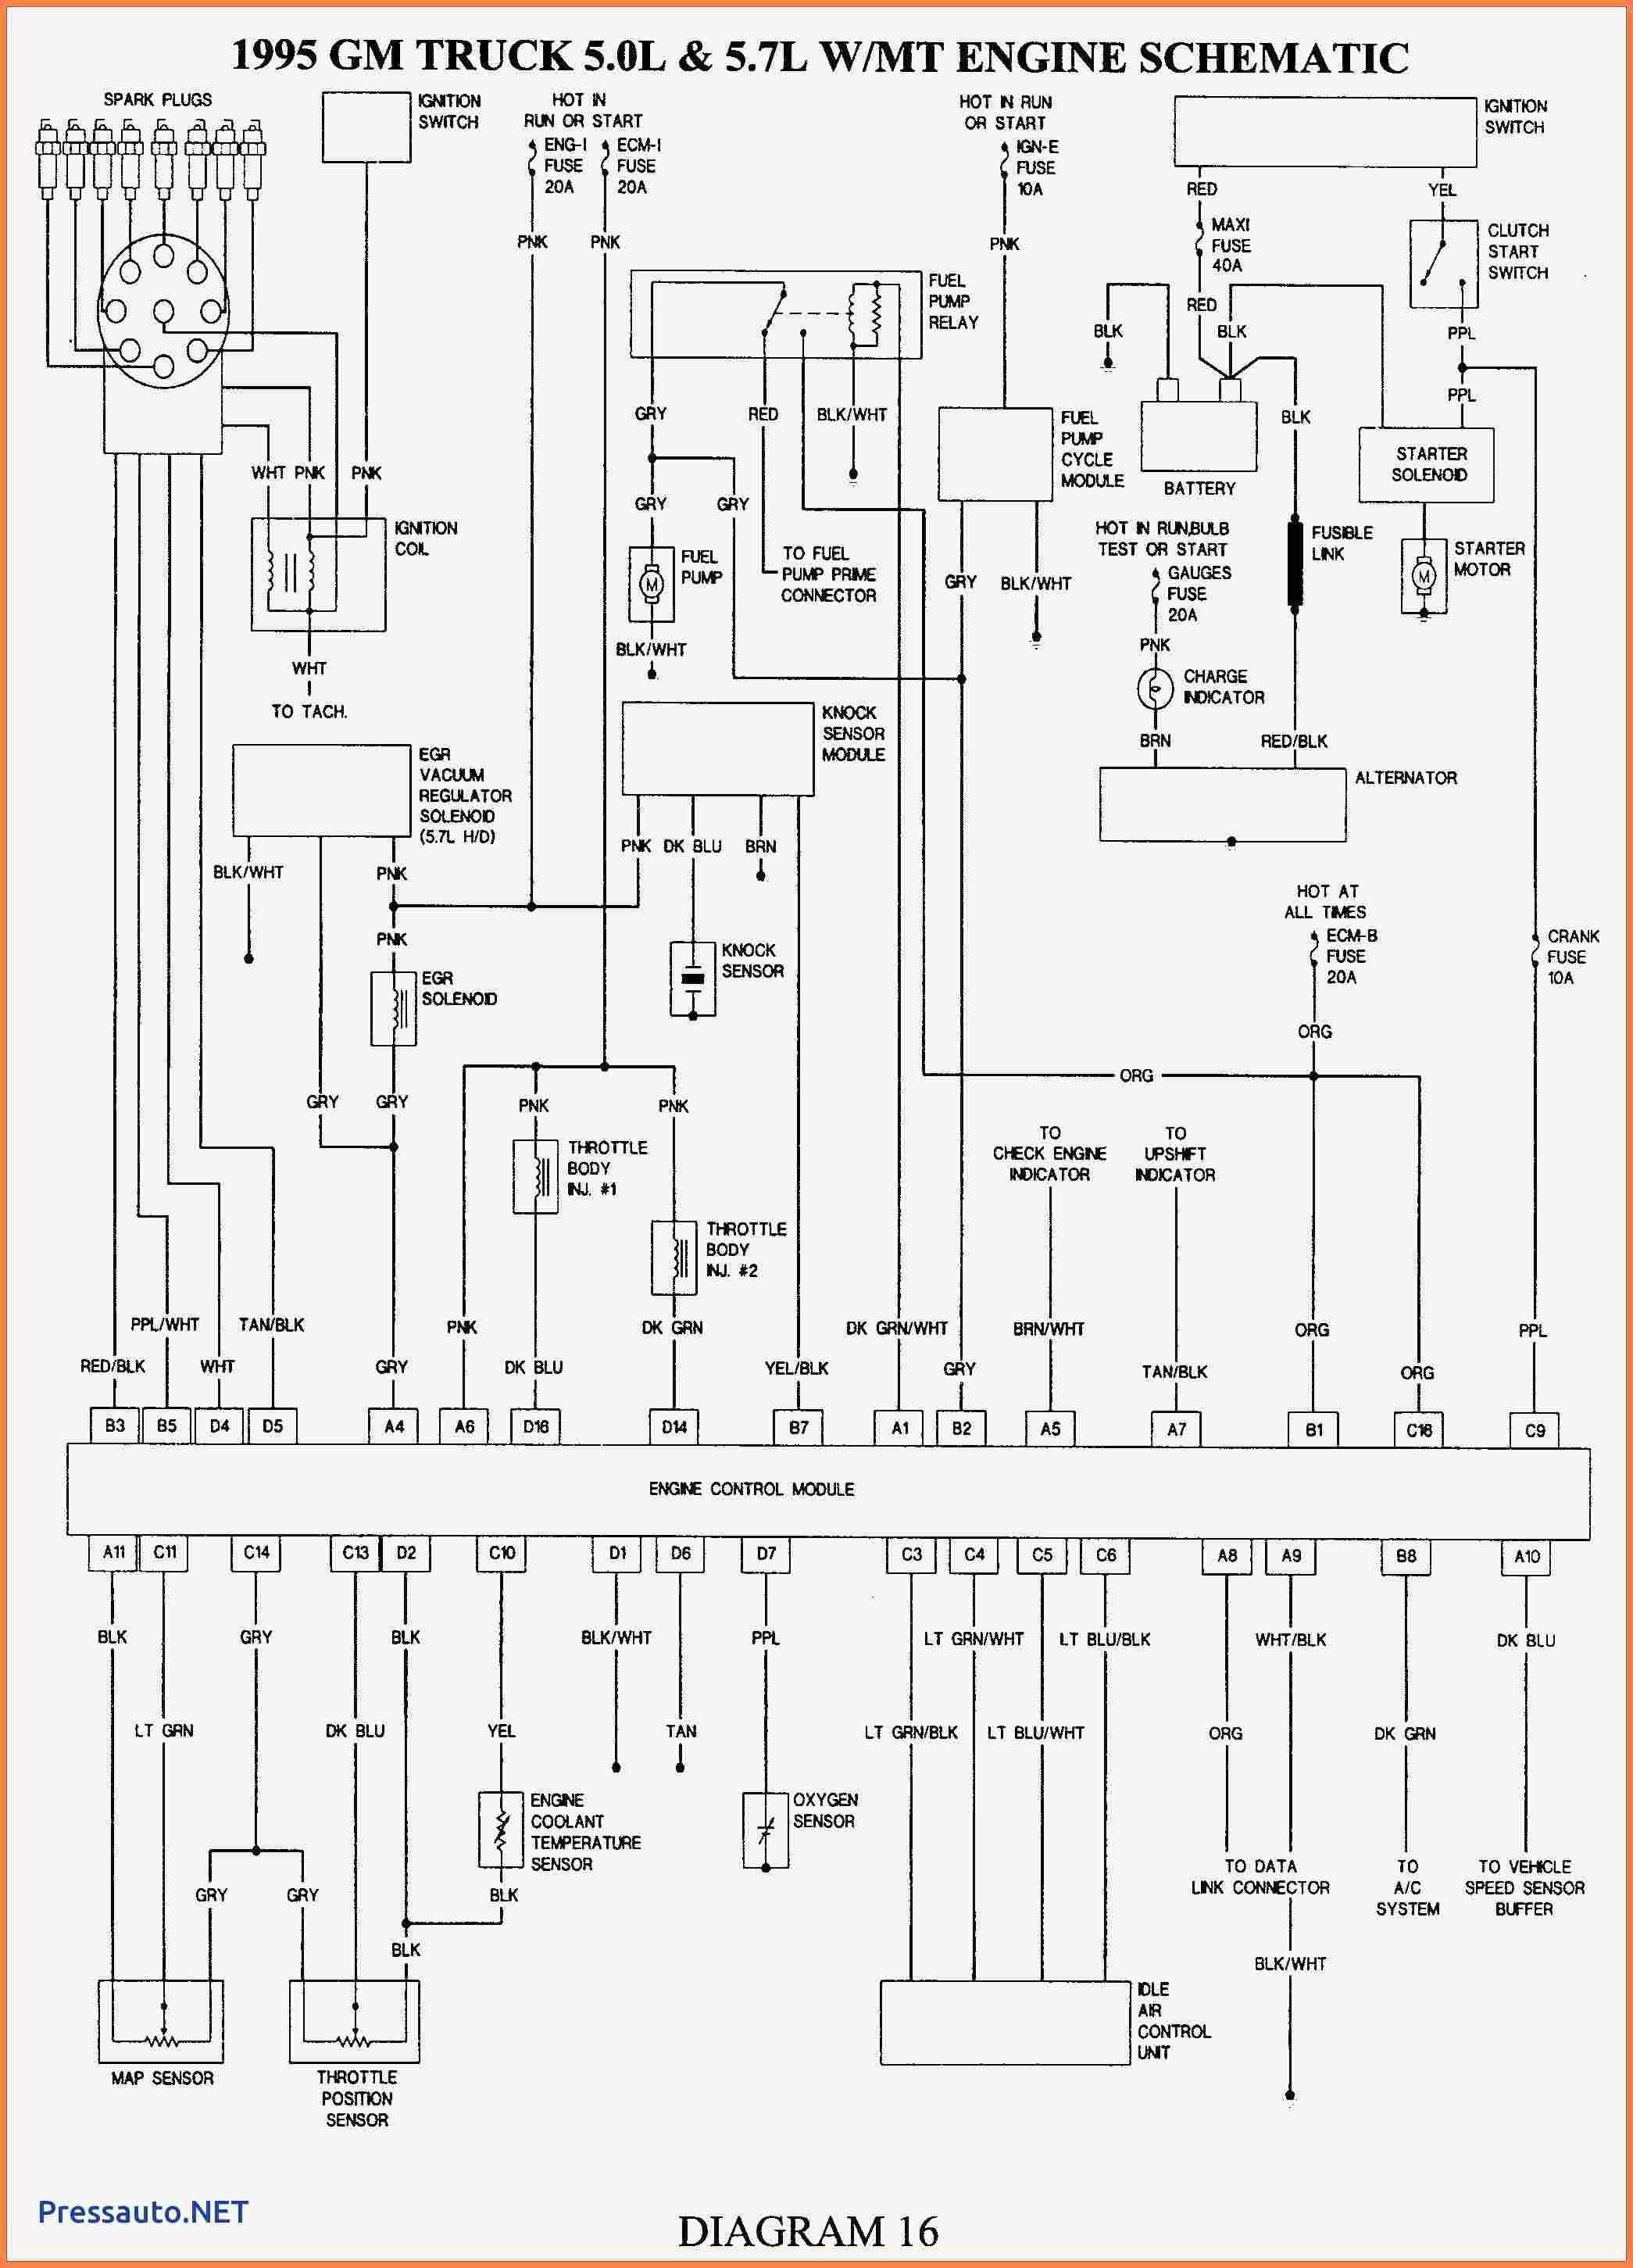 2003 Chevy Trailblazer Single Light Wire Diagram Ham Iii Wiring Diagram Of 2003 Chevy Trailblazer Single Light Wire Diagram